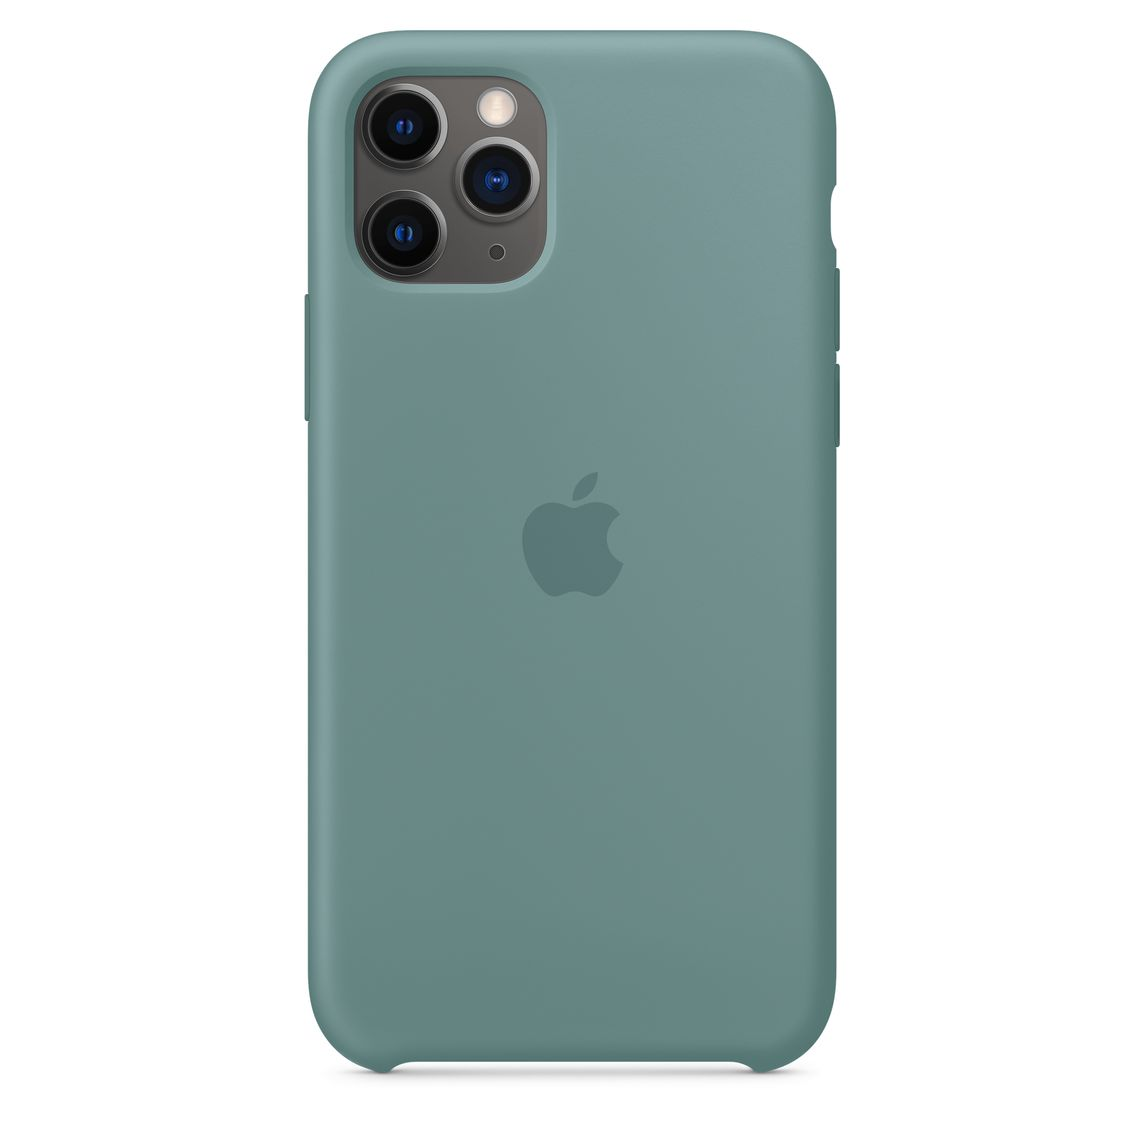 Custodia in silicone per iPhone